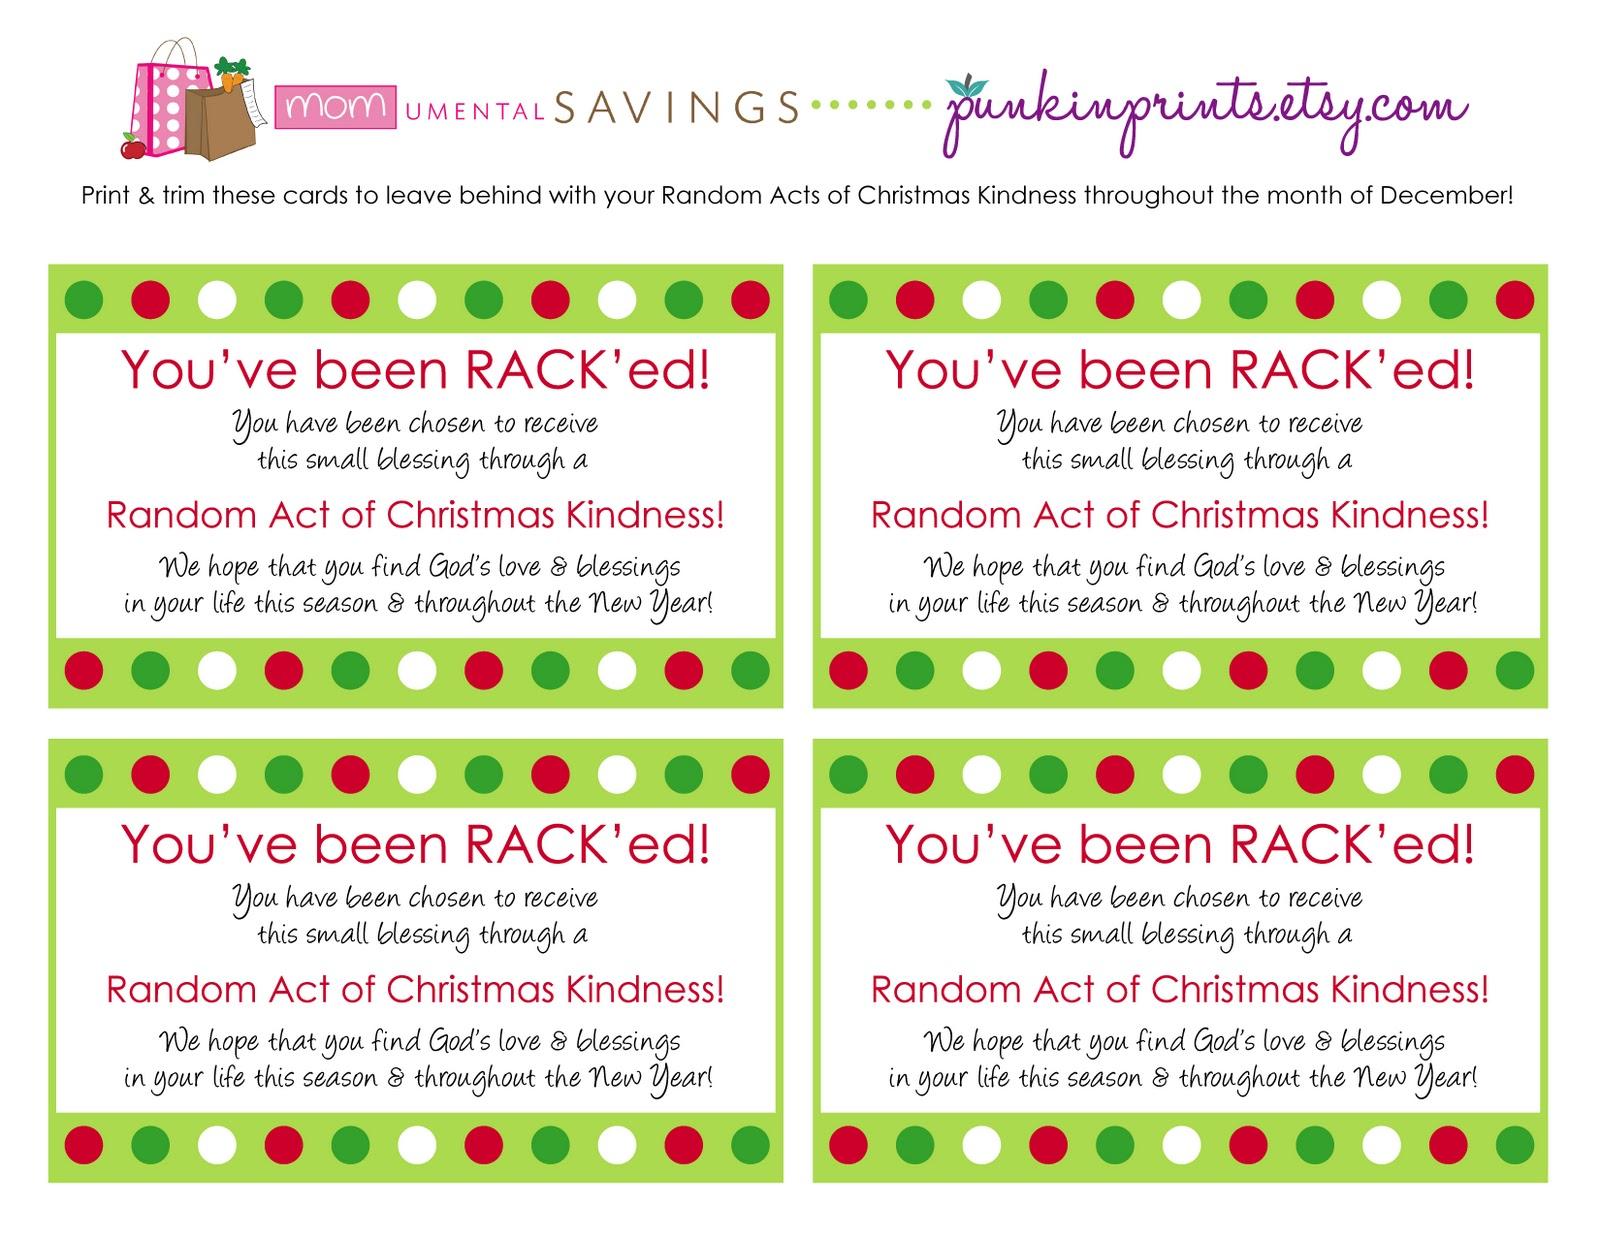 Momumental Savings Random Acts Of Christmas Kindness